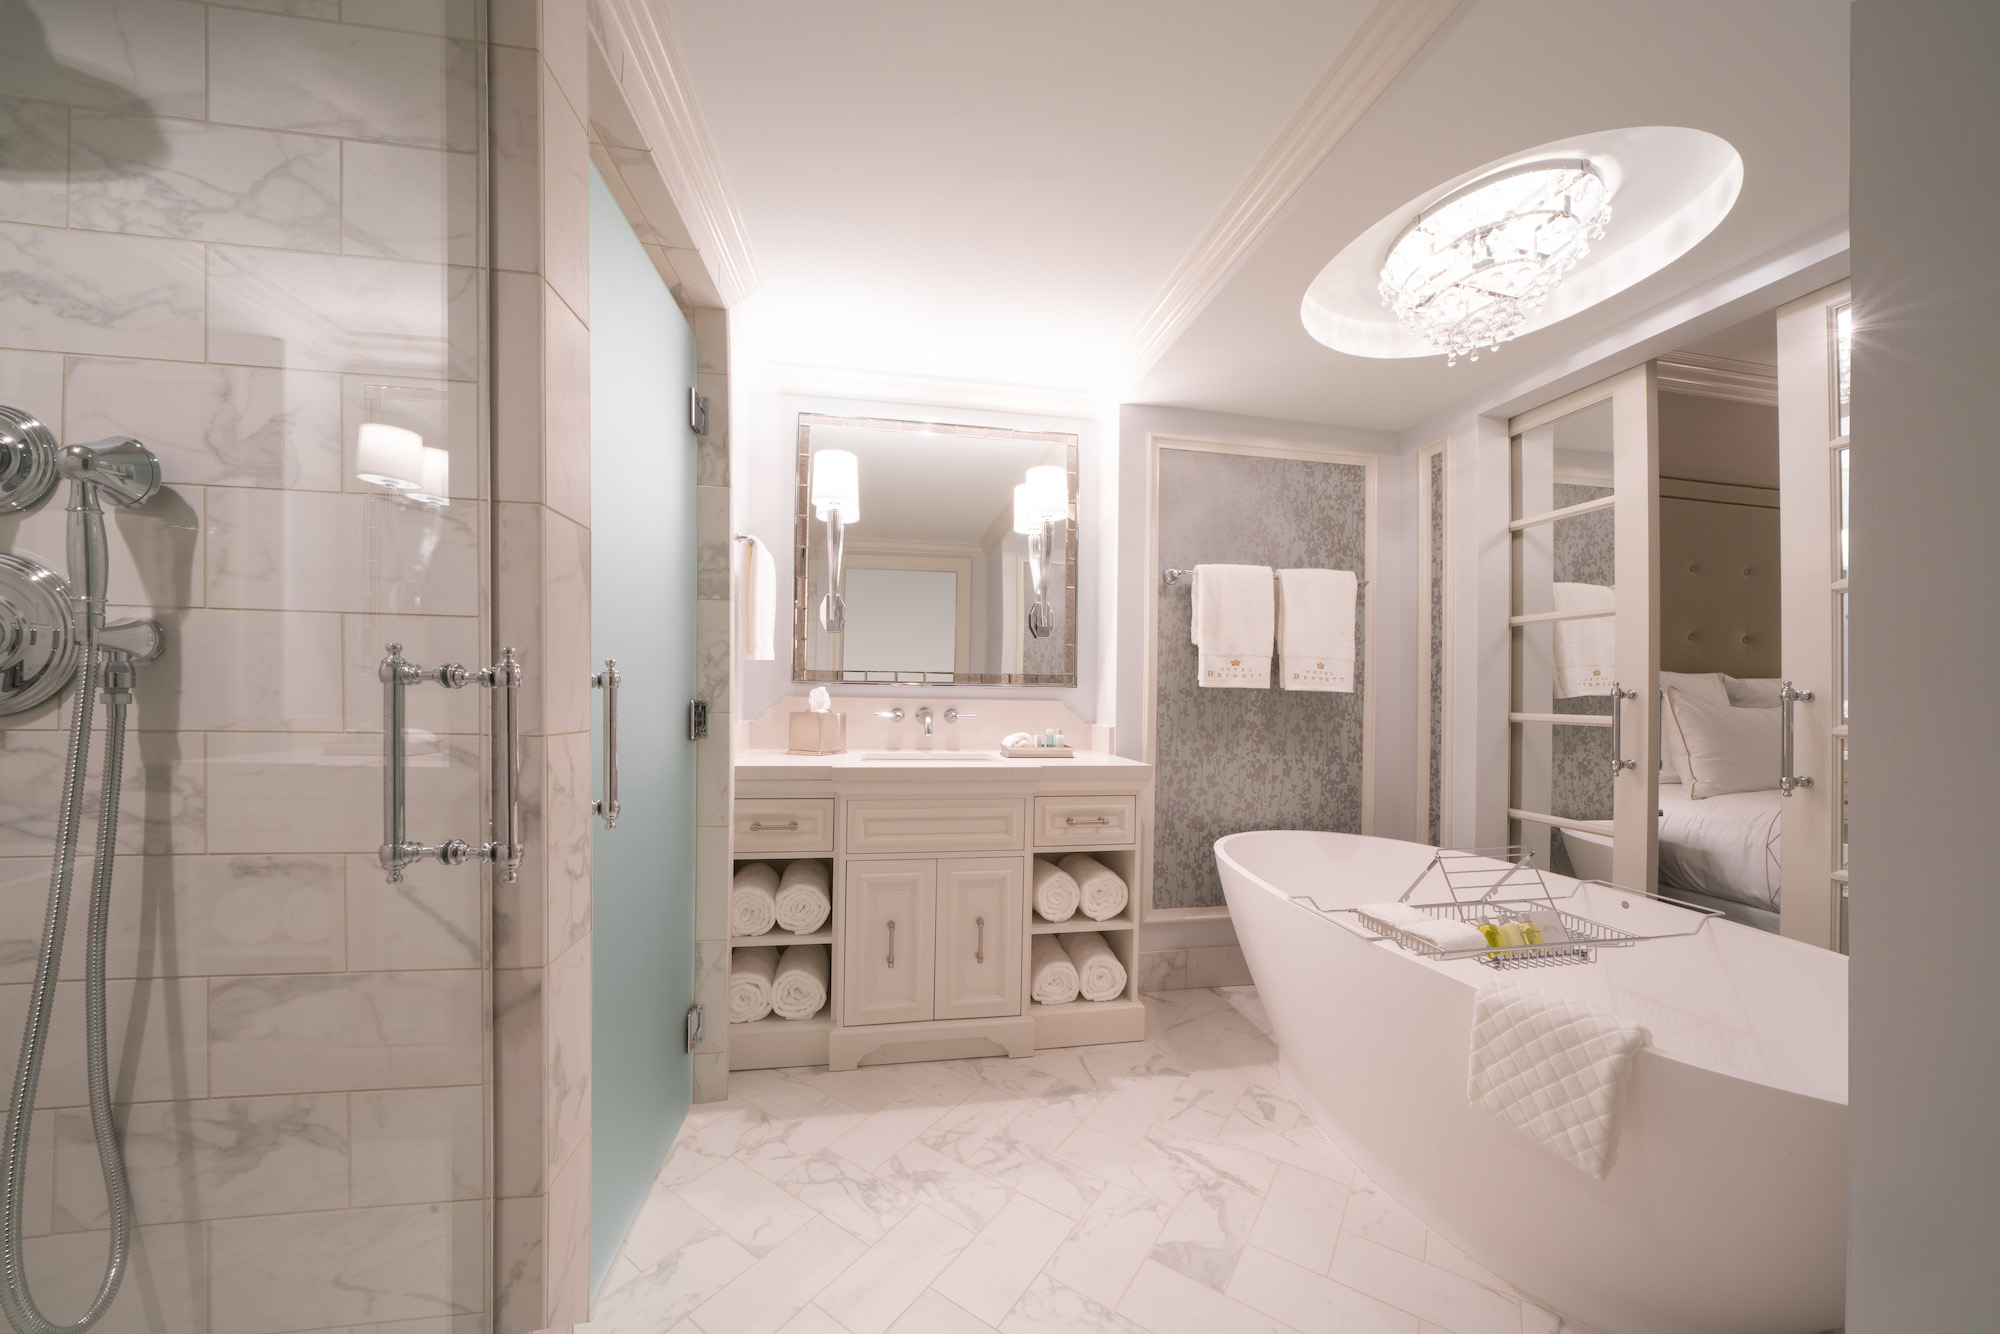 626 bathroom angle 2.jpg